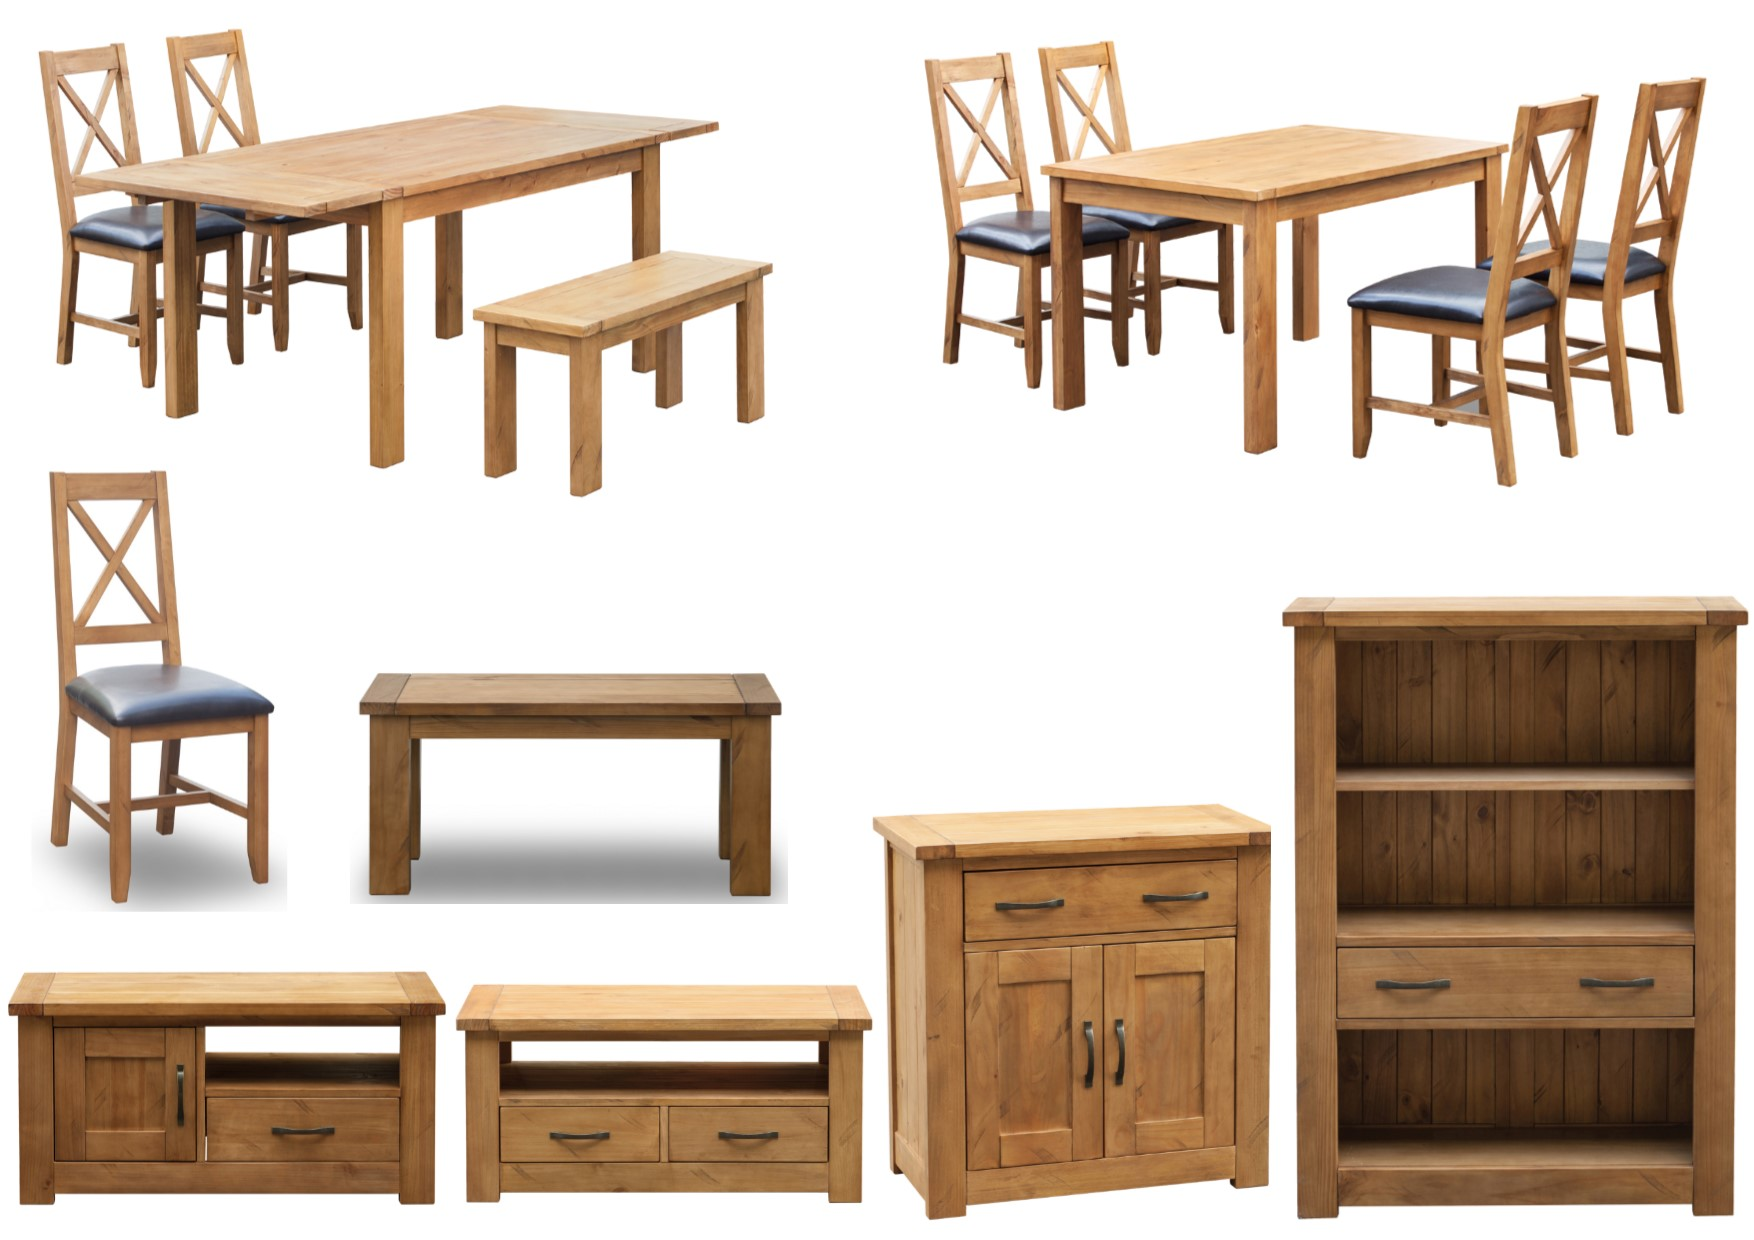 Boden Rough Sawn Pine Furniture